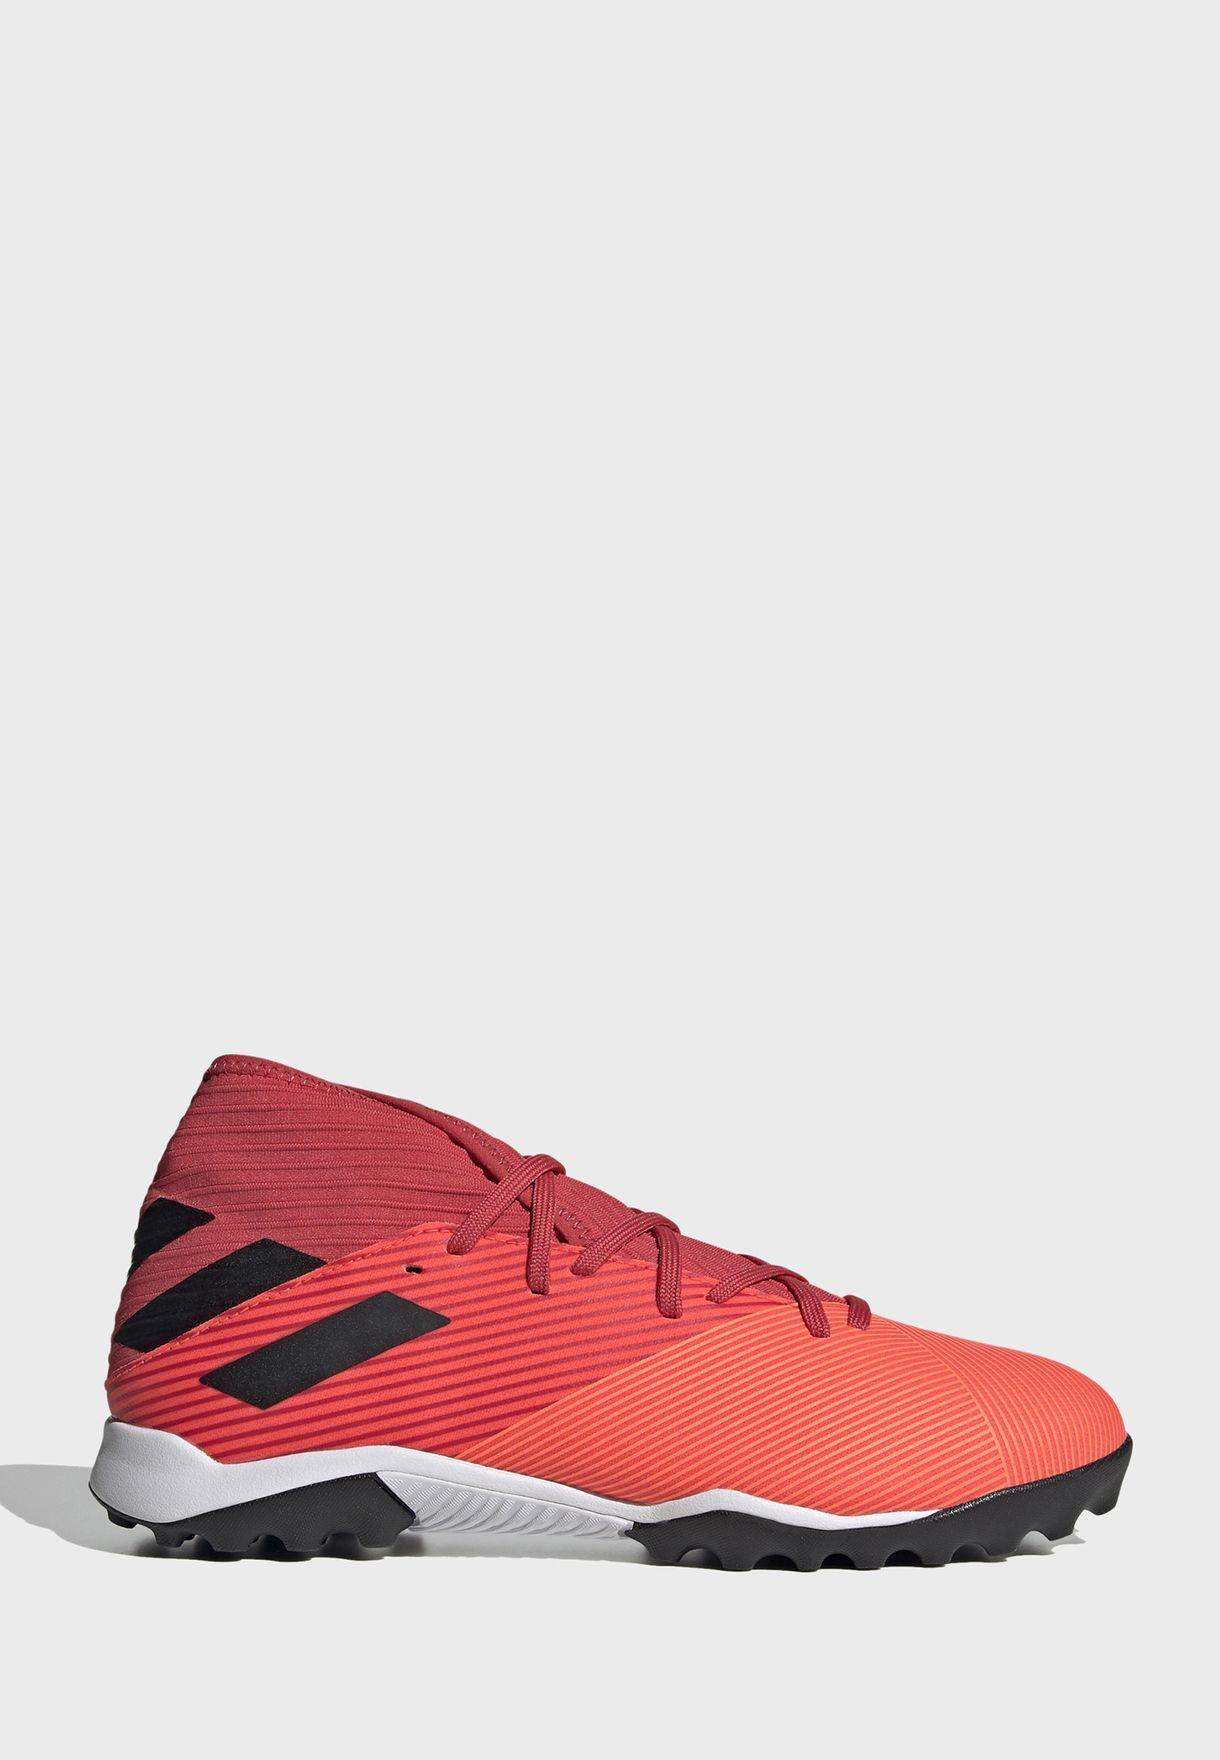 حذاء نيميزز 19.3 تي اف